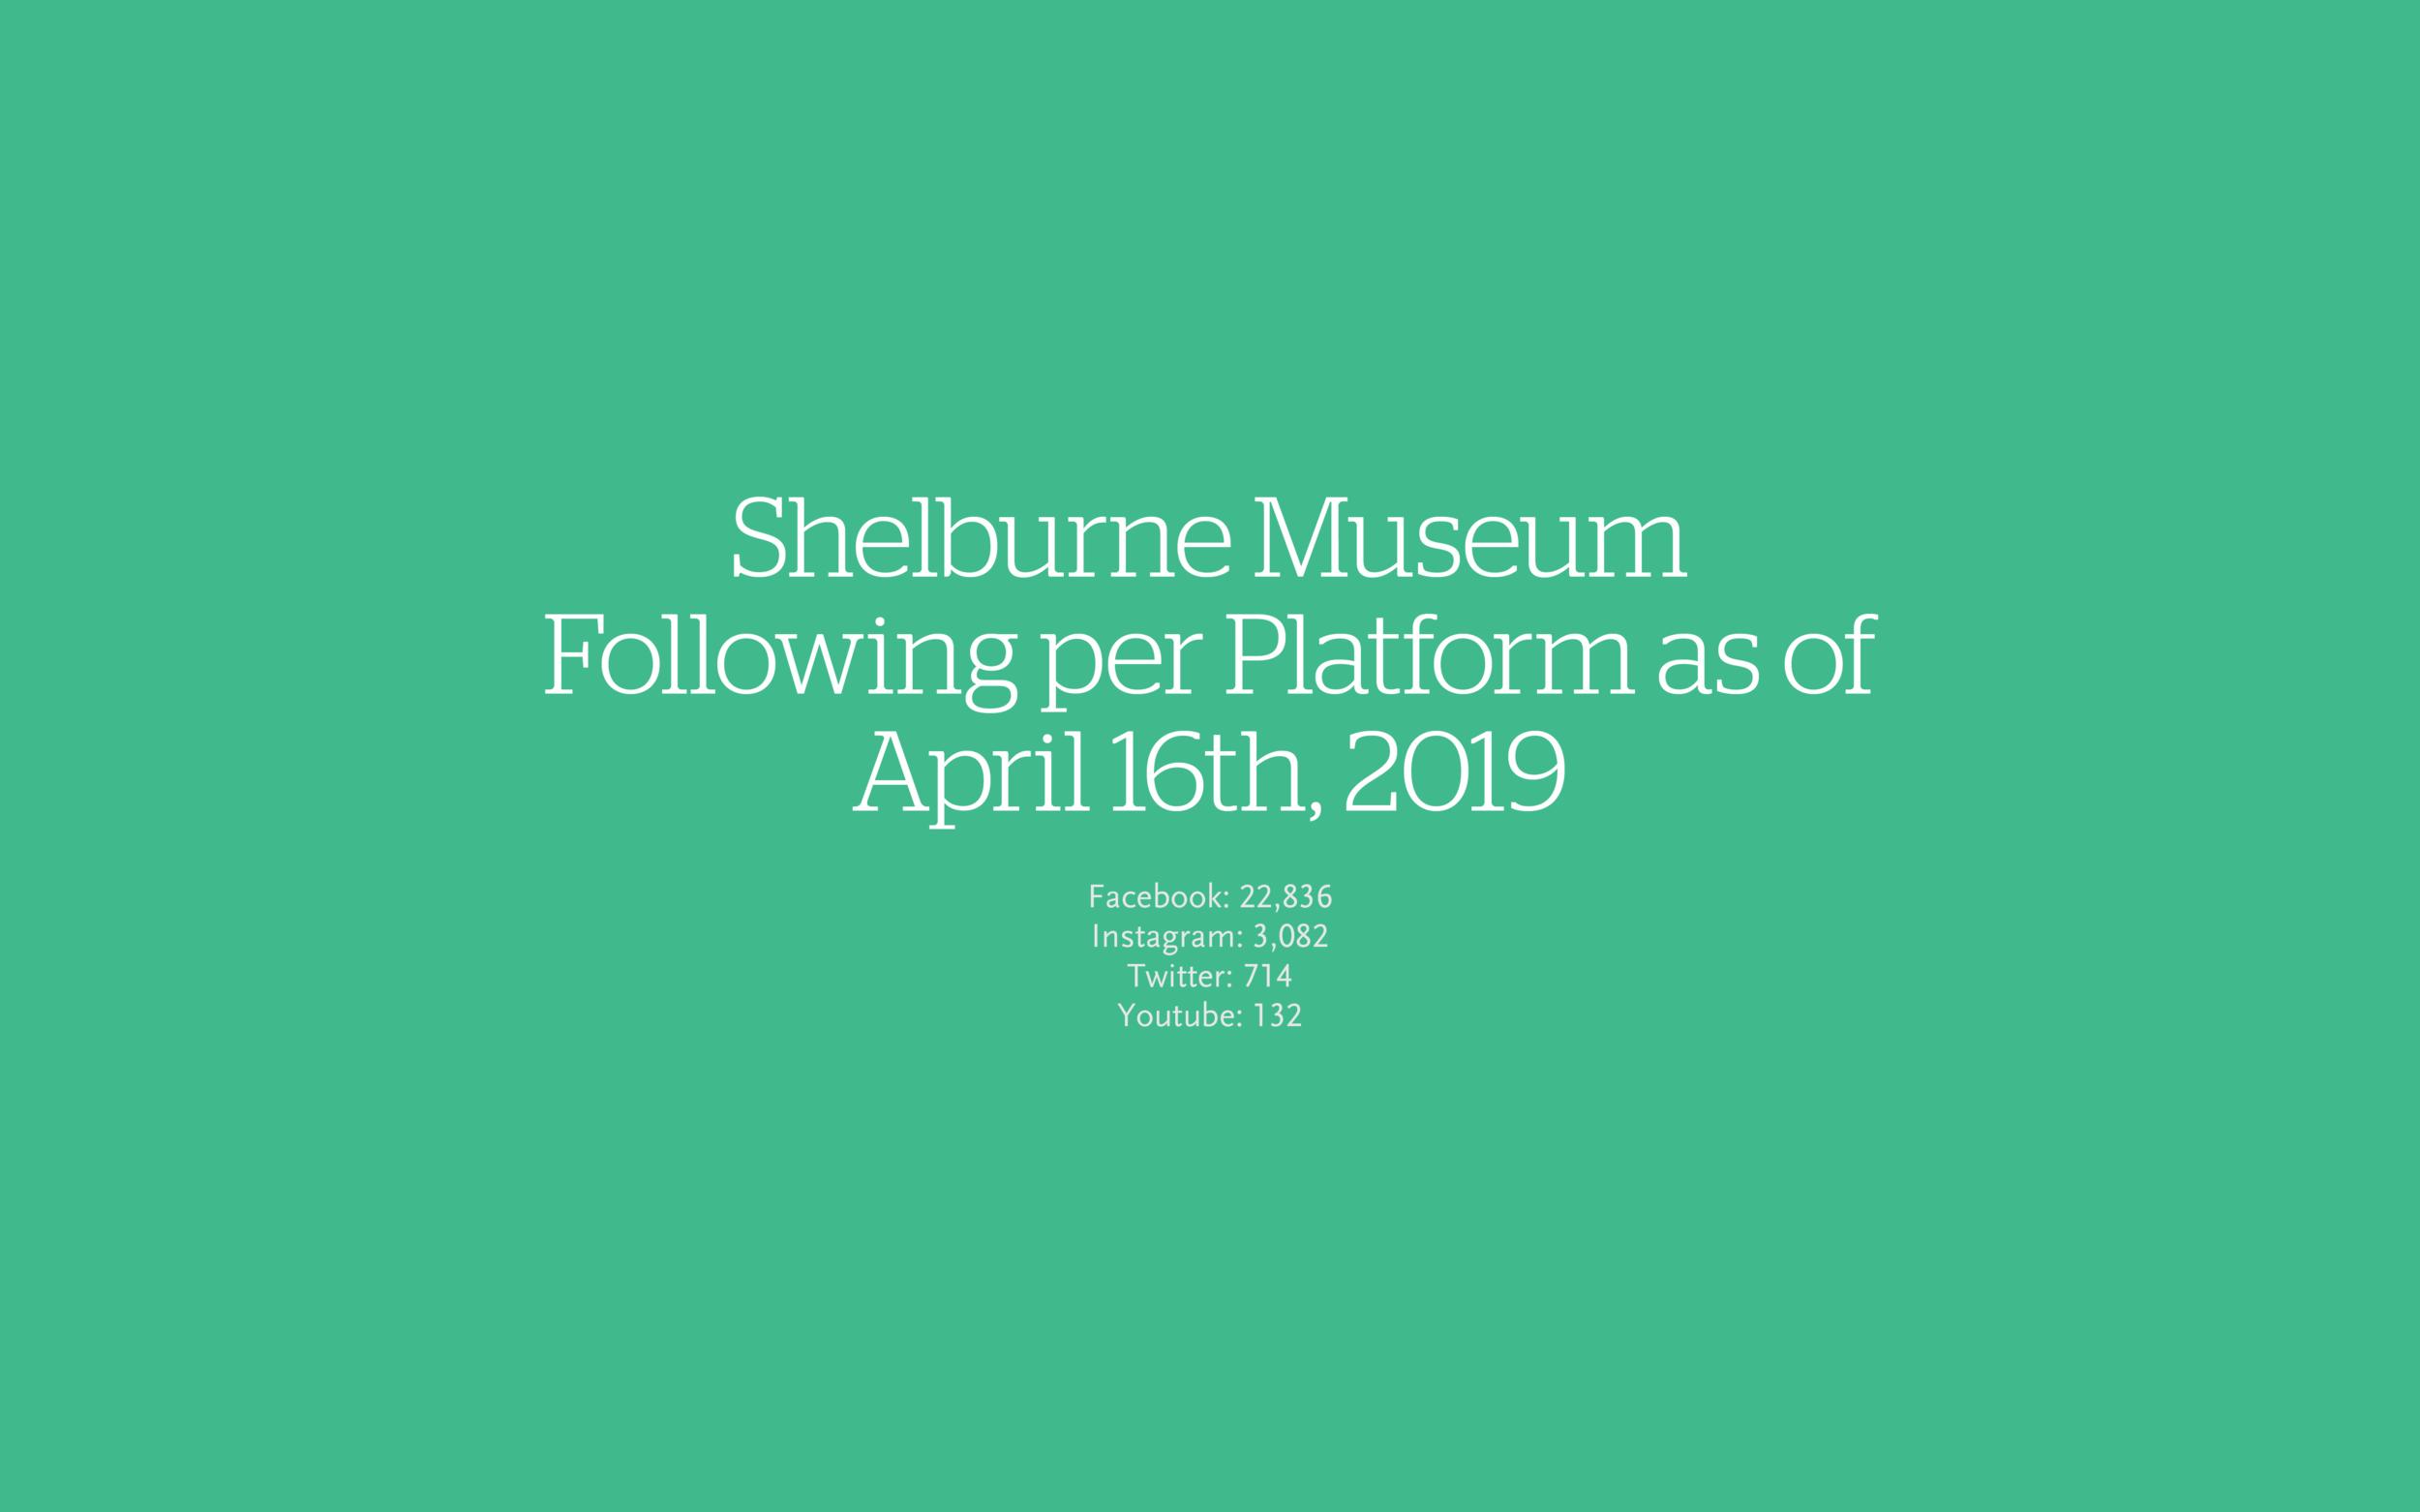 StirlingAdams_ShelburneMuseum_Draft2_030619_V212.png